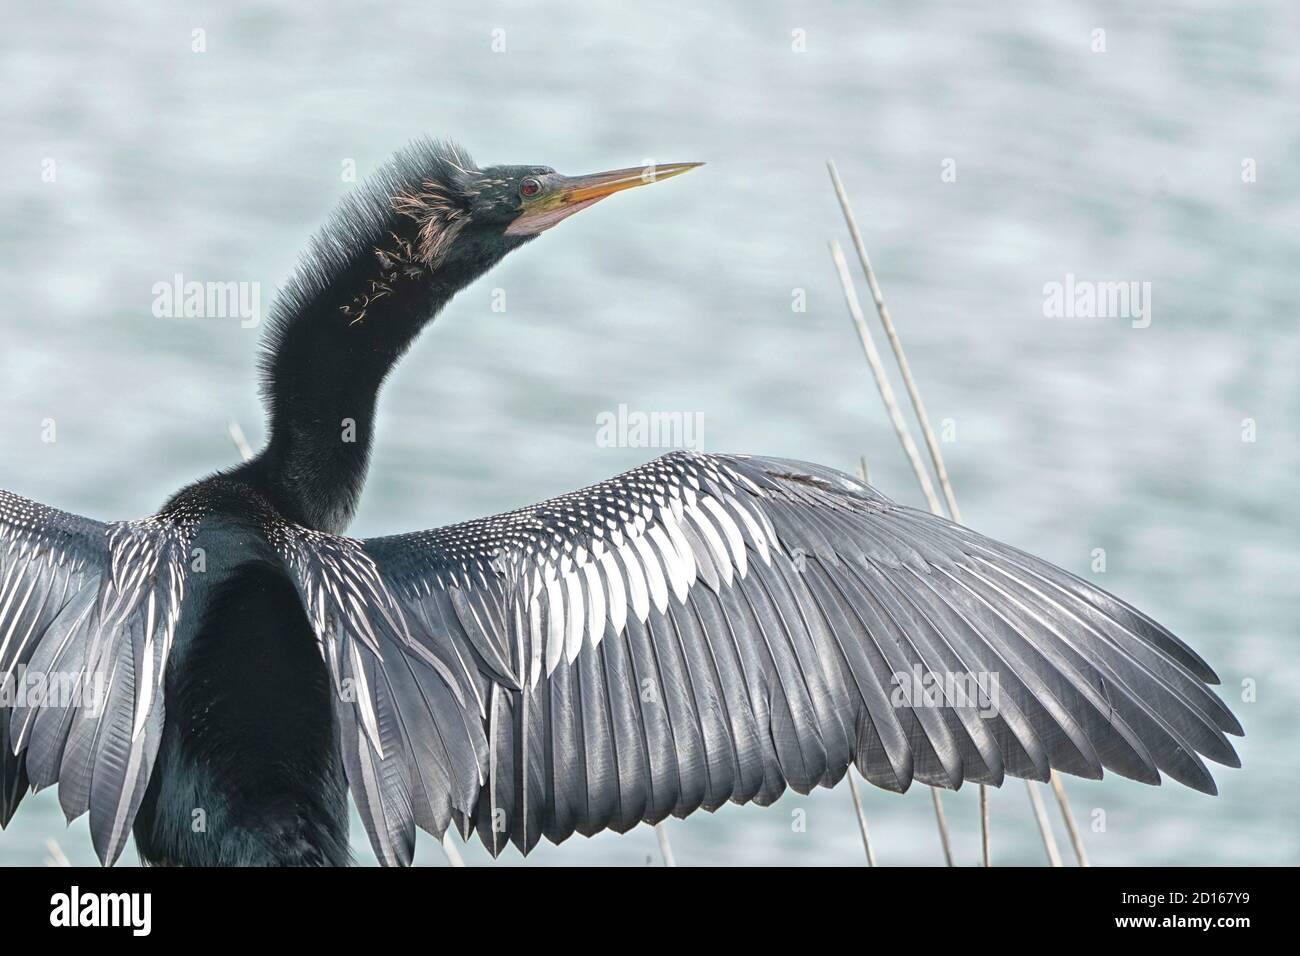 Anhinga, Anhinga anhinga, secando sus alas ya que no tiene plumas impermeables. Foto de stock